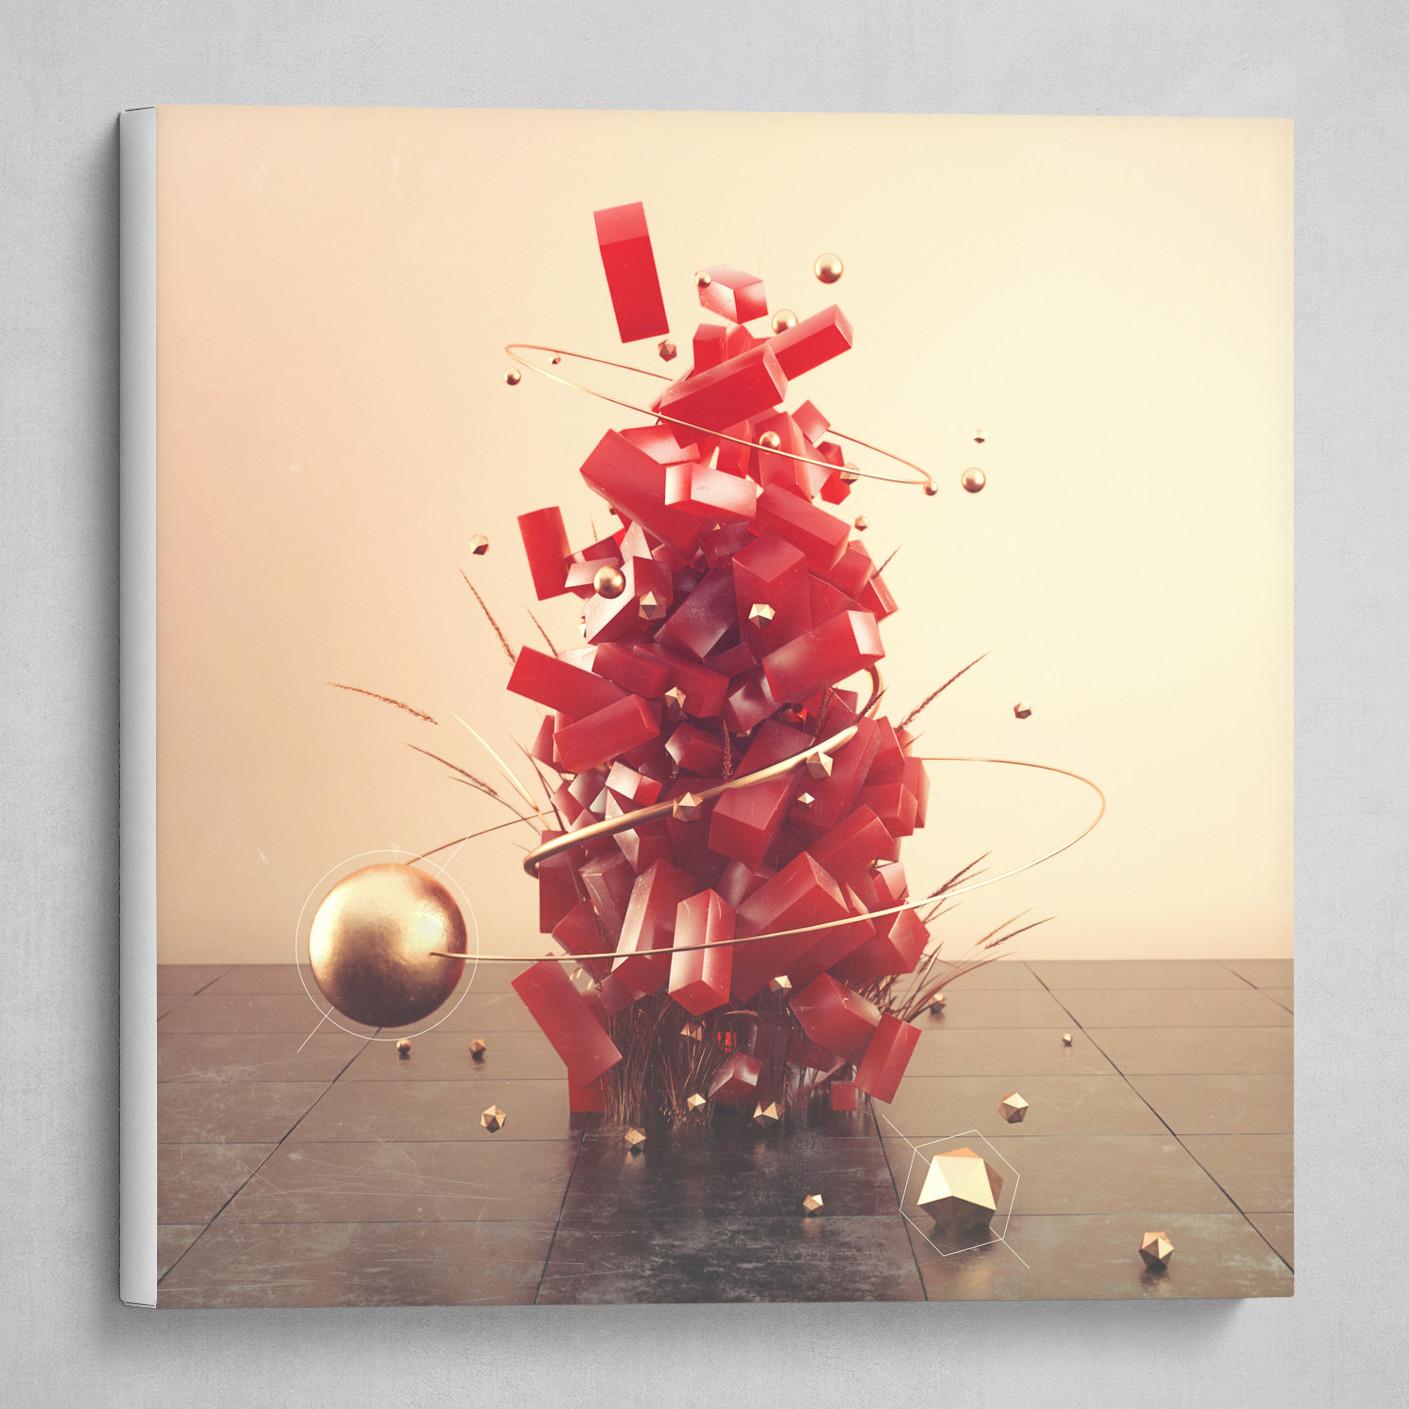 Lakhwinder Singh - Abstract Art - VI